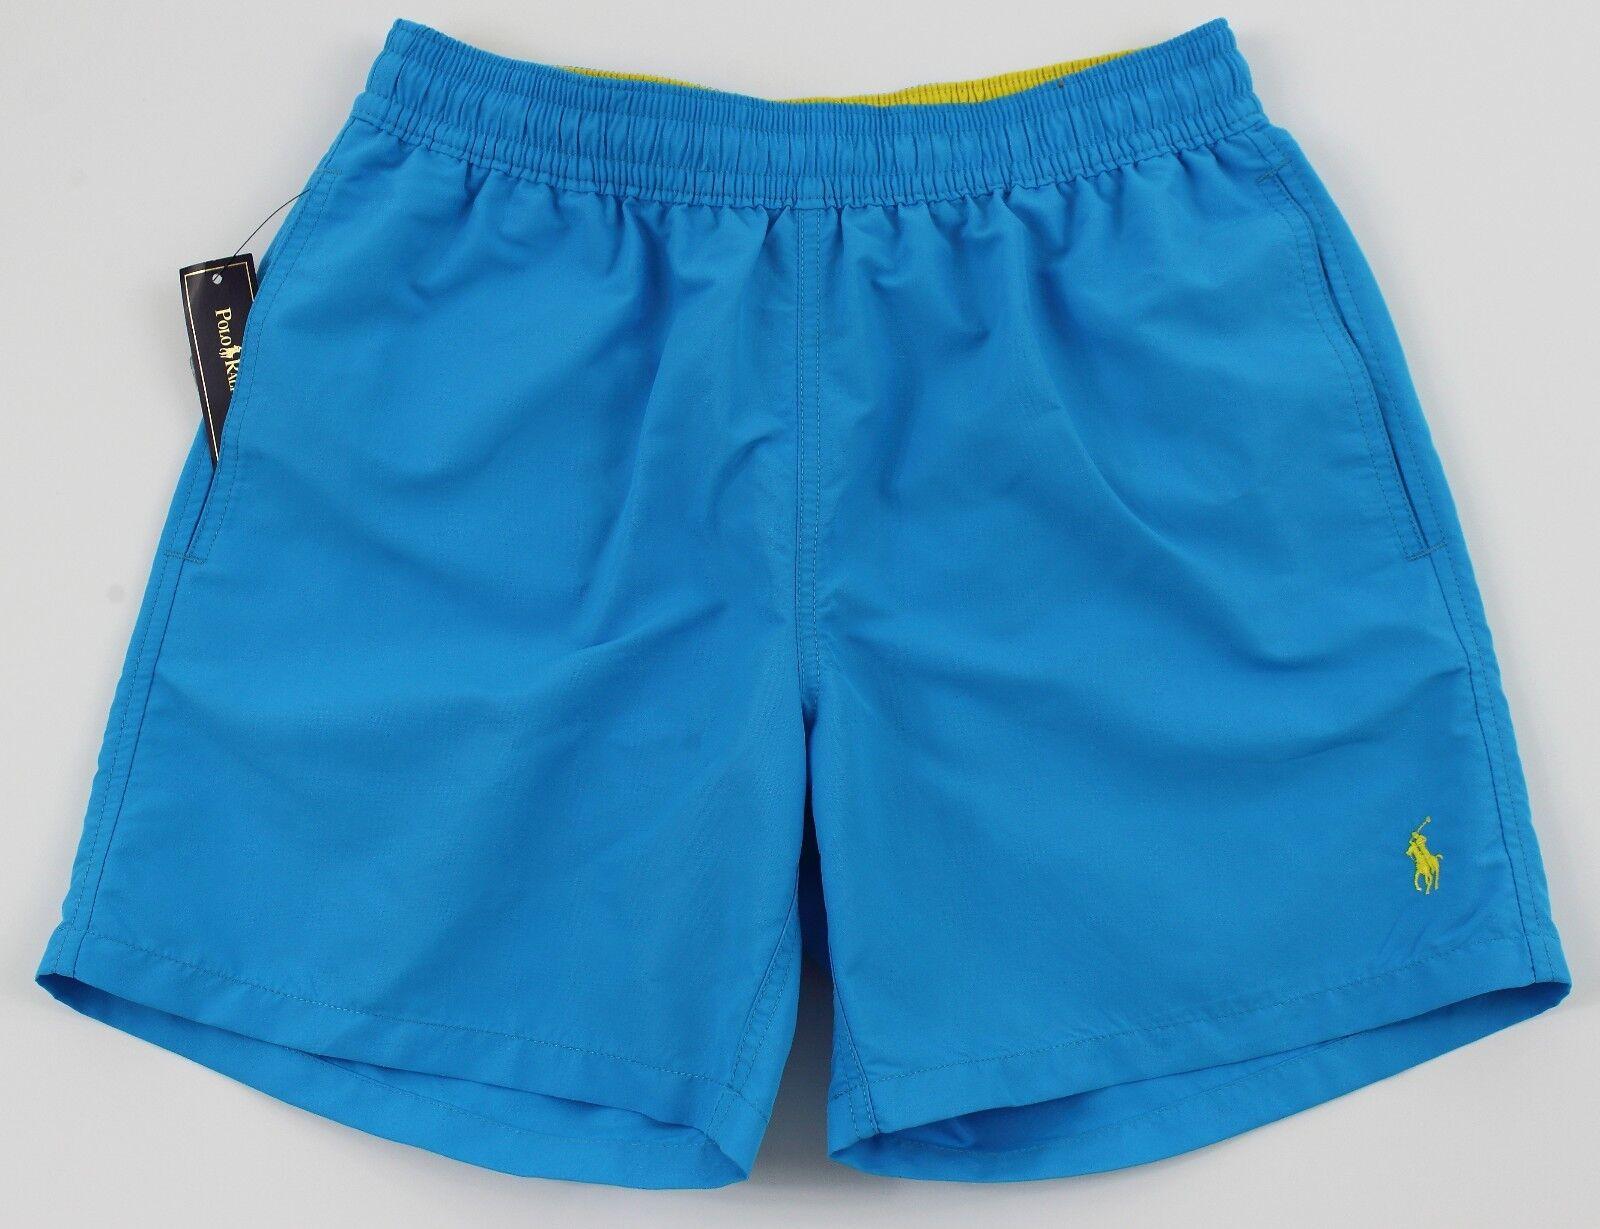 Men's POLO RALPH LAUREN Aqua Turquoise Swimsuit Trunks XL XLarge NWT NEW 4106174